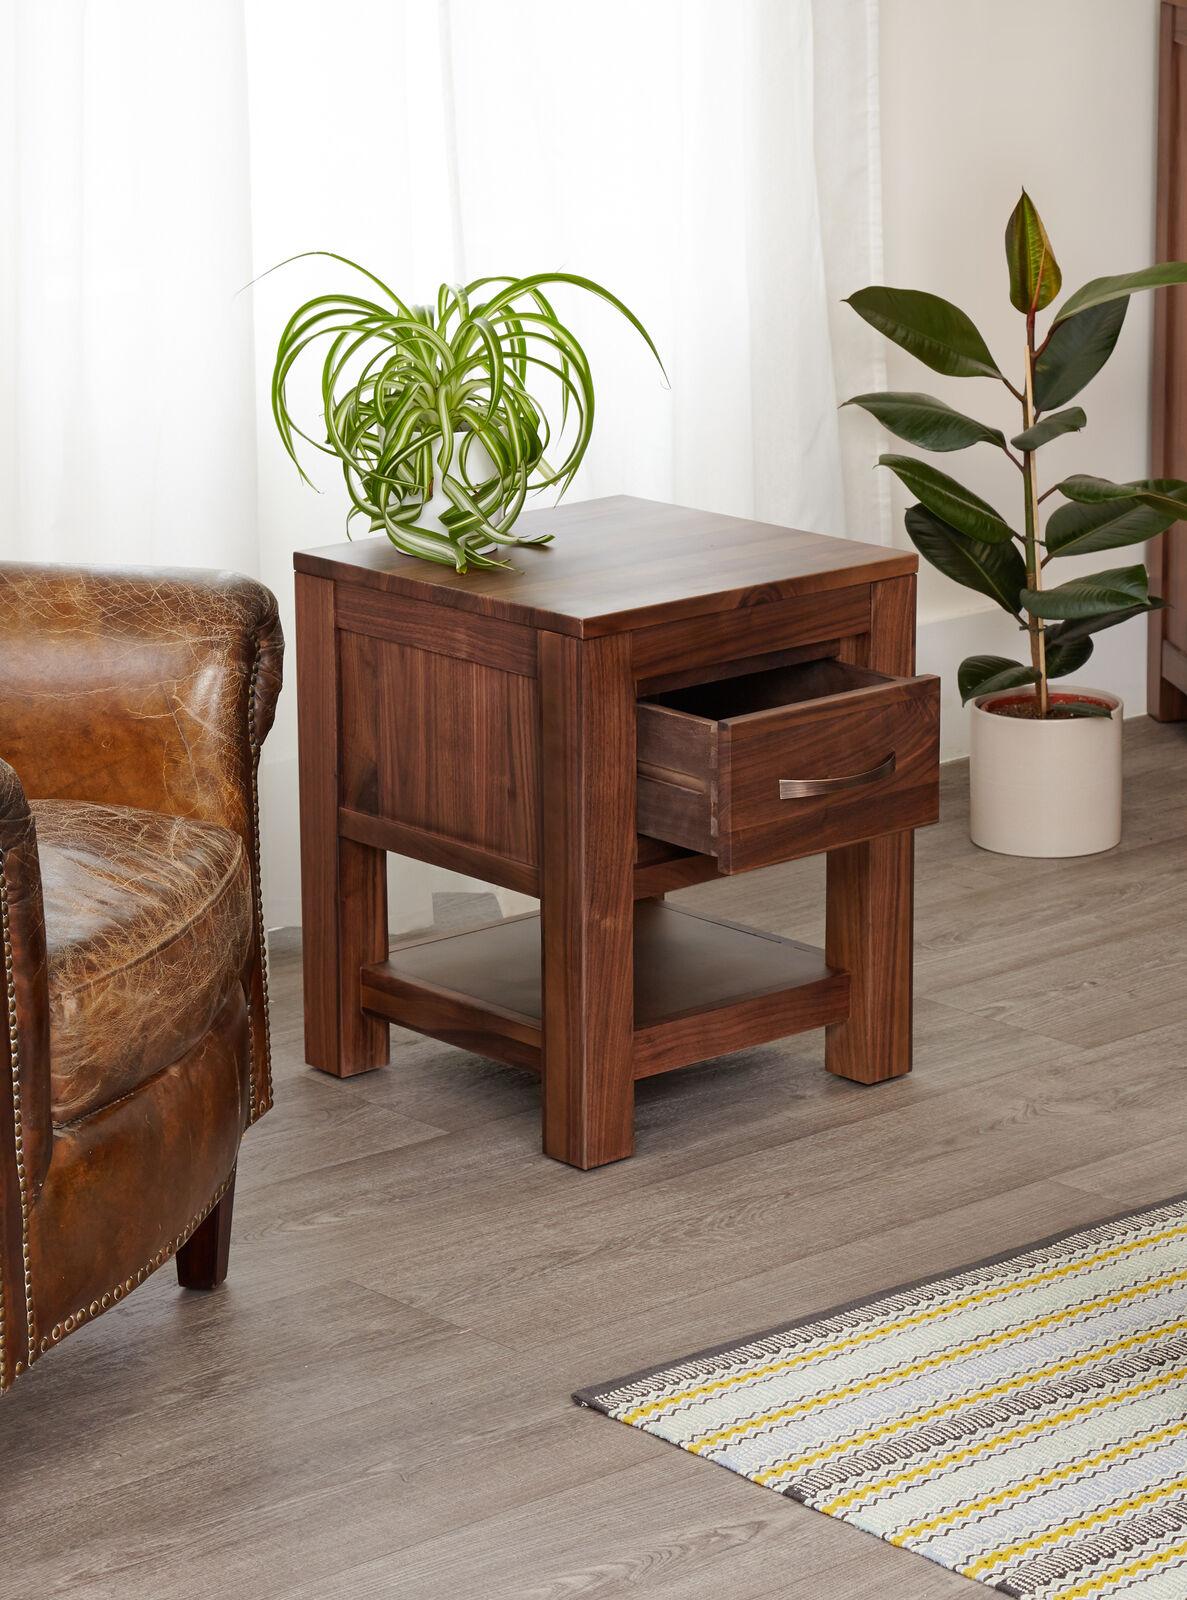 Mayan solid walnut dark wood lamp table bedside cabinet with 1 mayan solid walnut dark wood lamp table bedside cabinet with 1 drawer aloadofball Choice Image